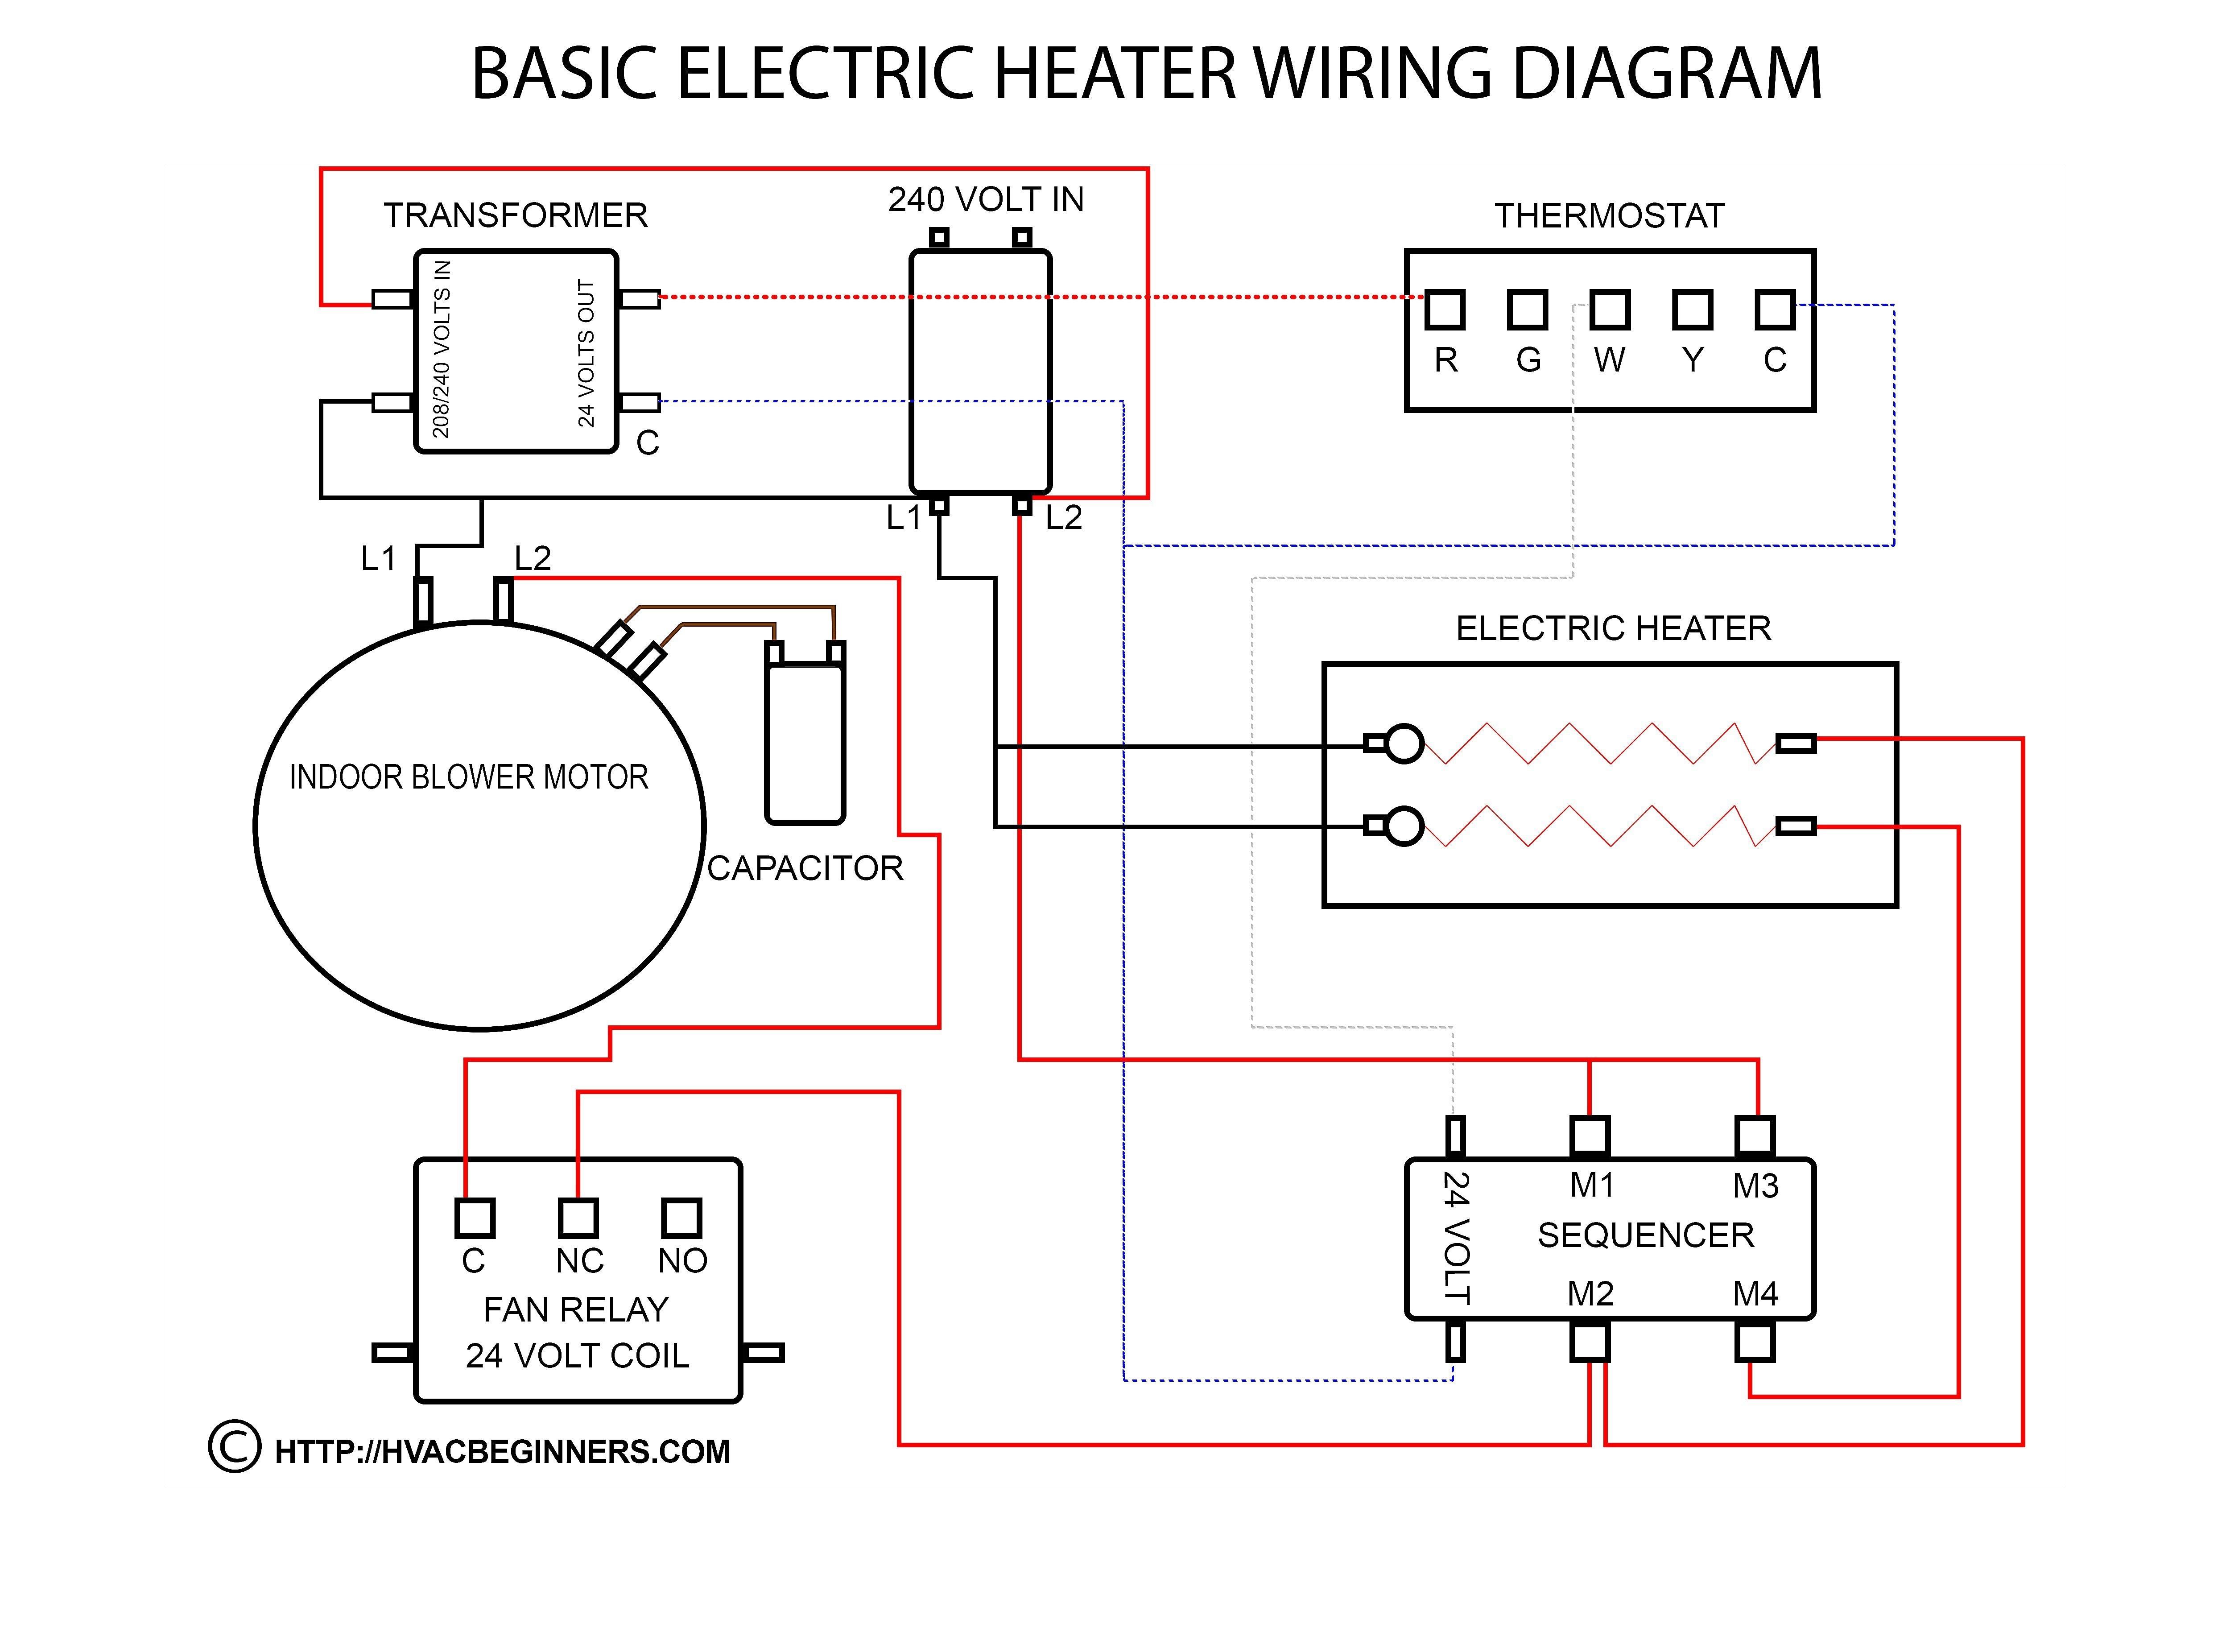 Wiring Diagram 220 Volt Baseboard Heater Inspirationa Wiring Diagram for 220v Baseboard Heater Save 240 Volt